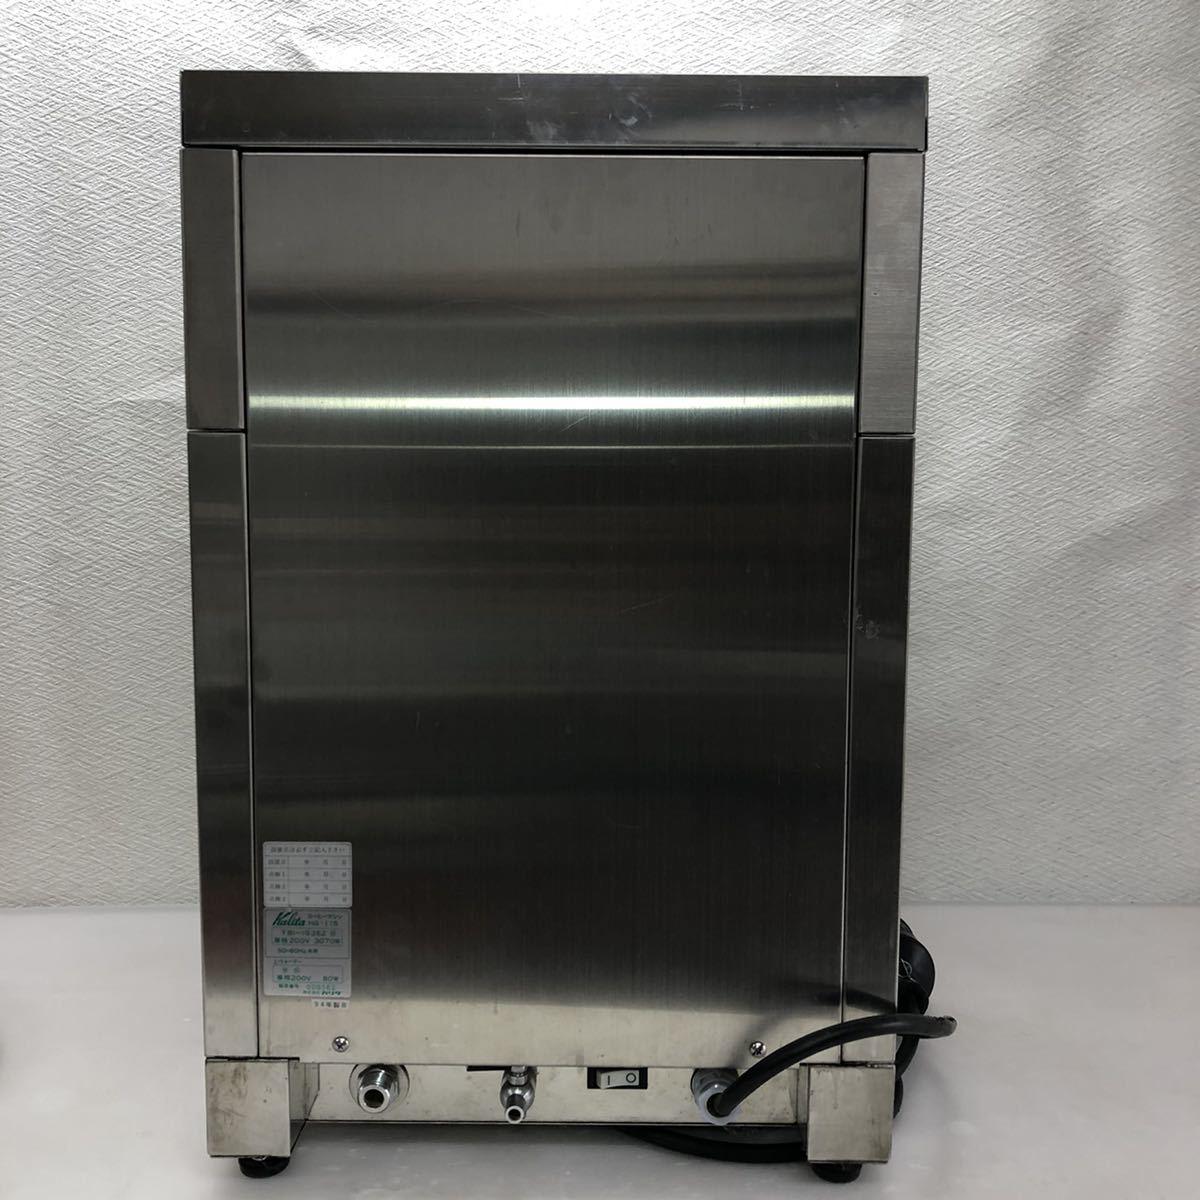 Kalita カリタ ◆ MICON COFFEE MACHINE ◆ Model HG-115 ◆業務用コーヒーマシン_画像3